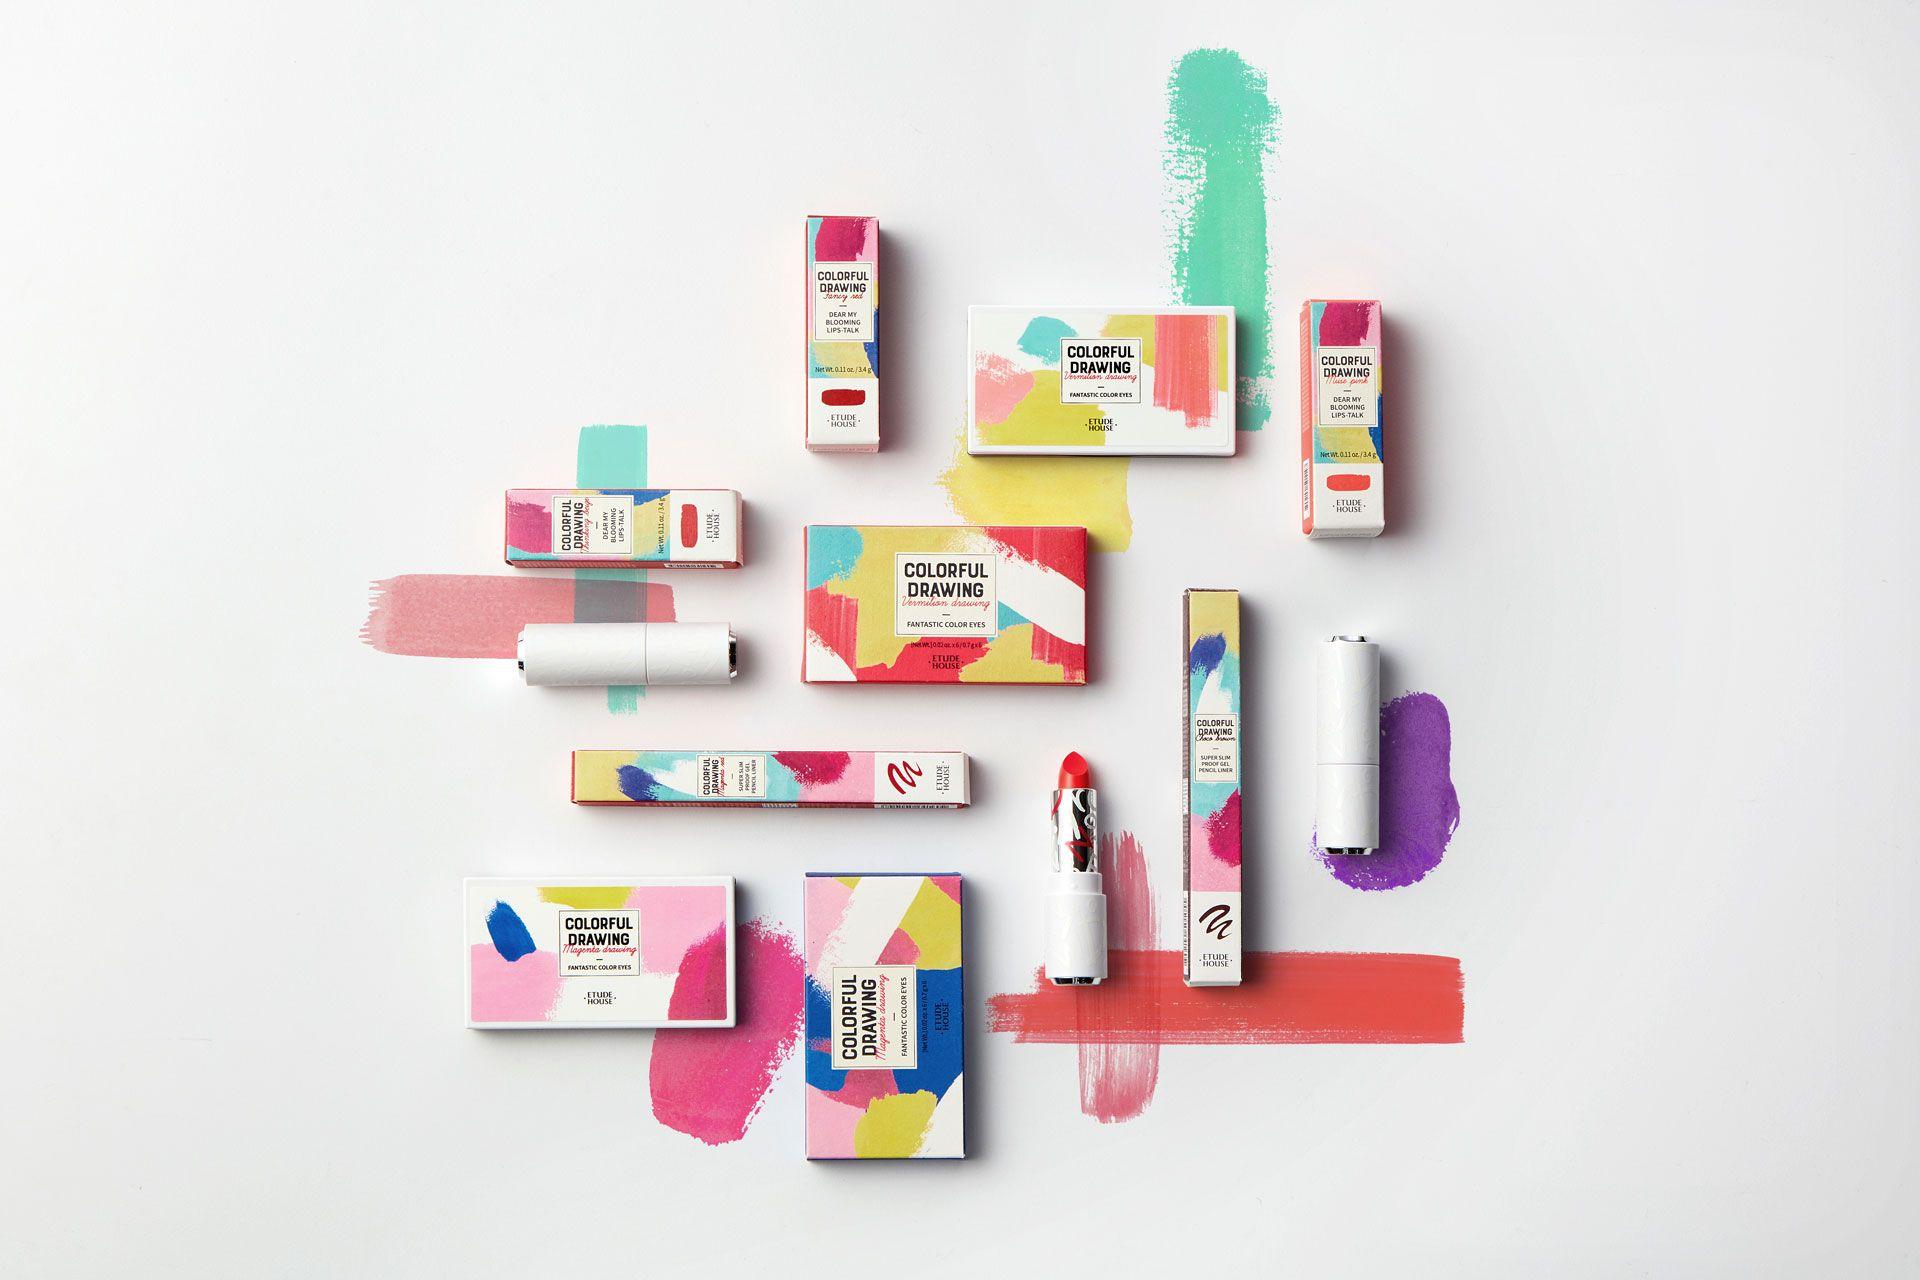 ohSeven 다채로운 그림, 화장품 디자인, 화장품